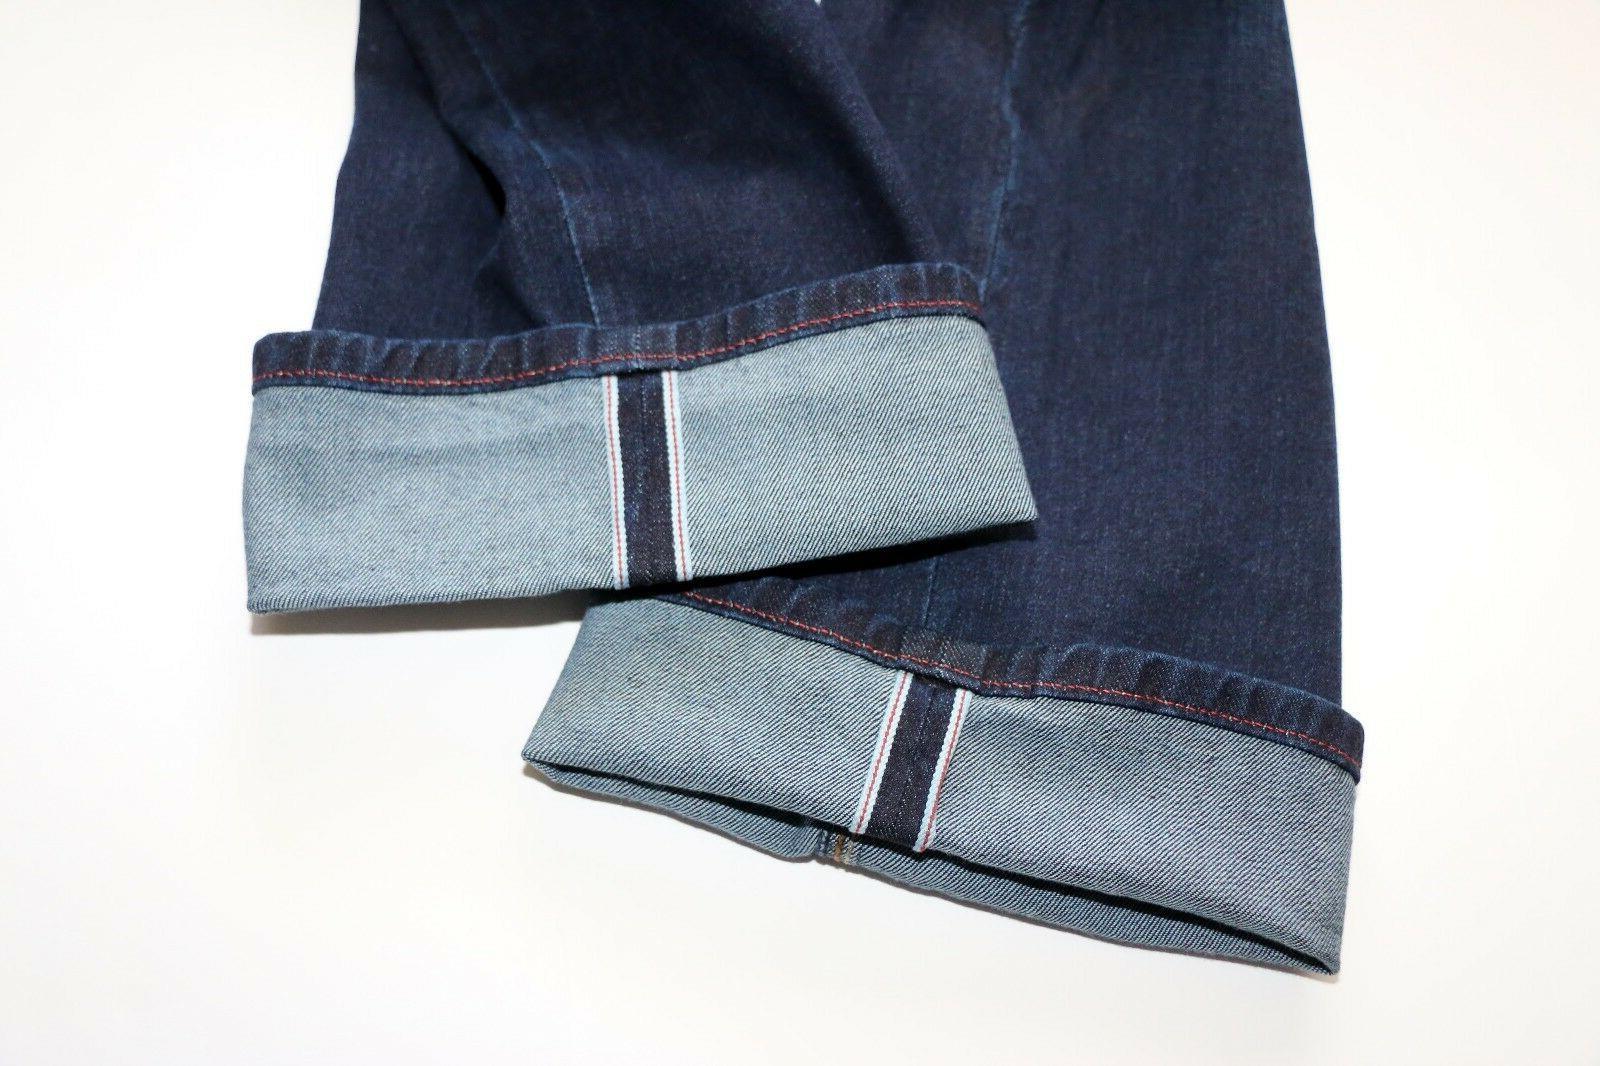 New Fit Jeans Denim Sizes